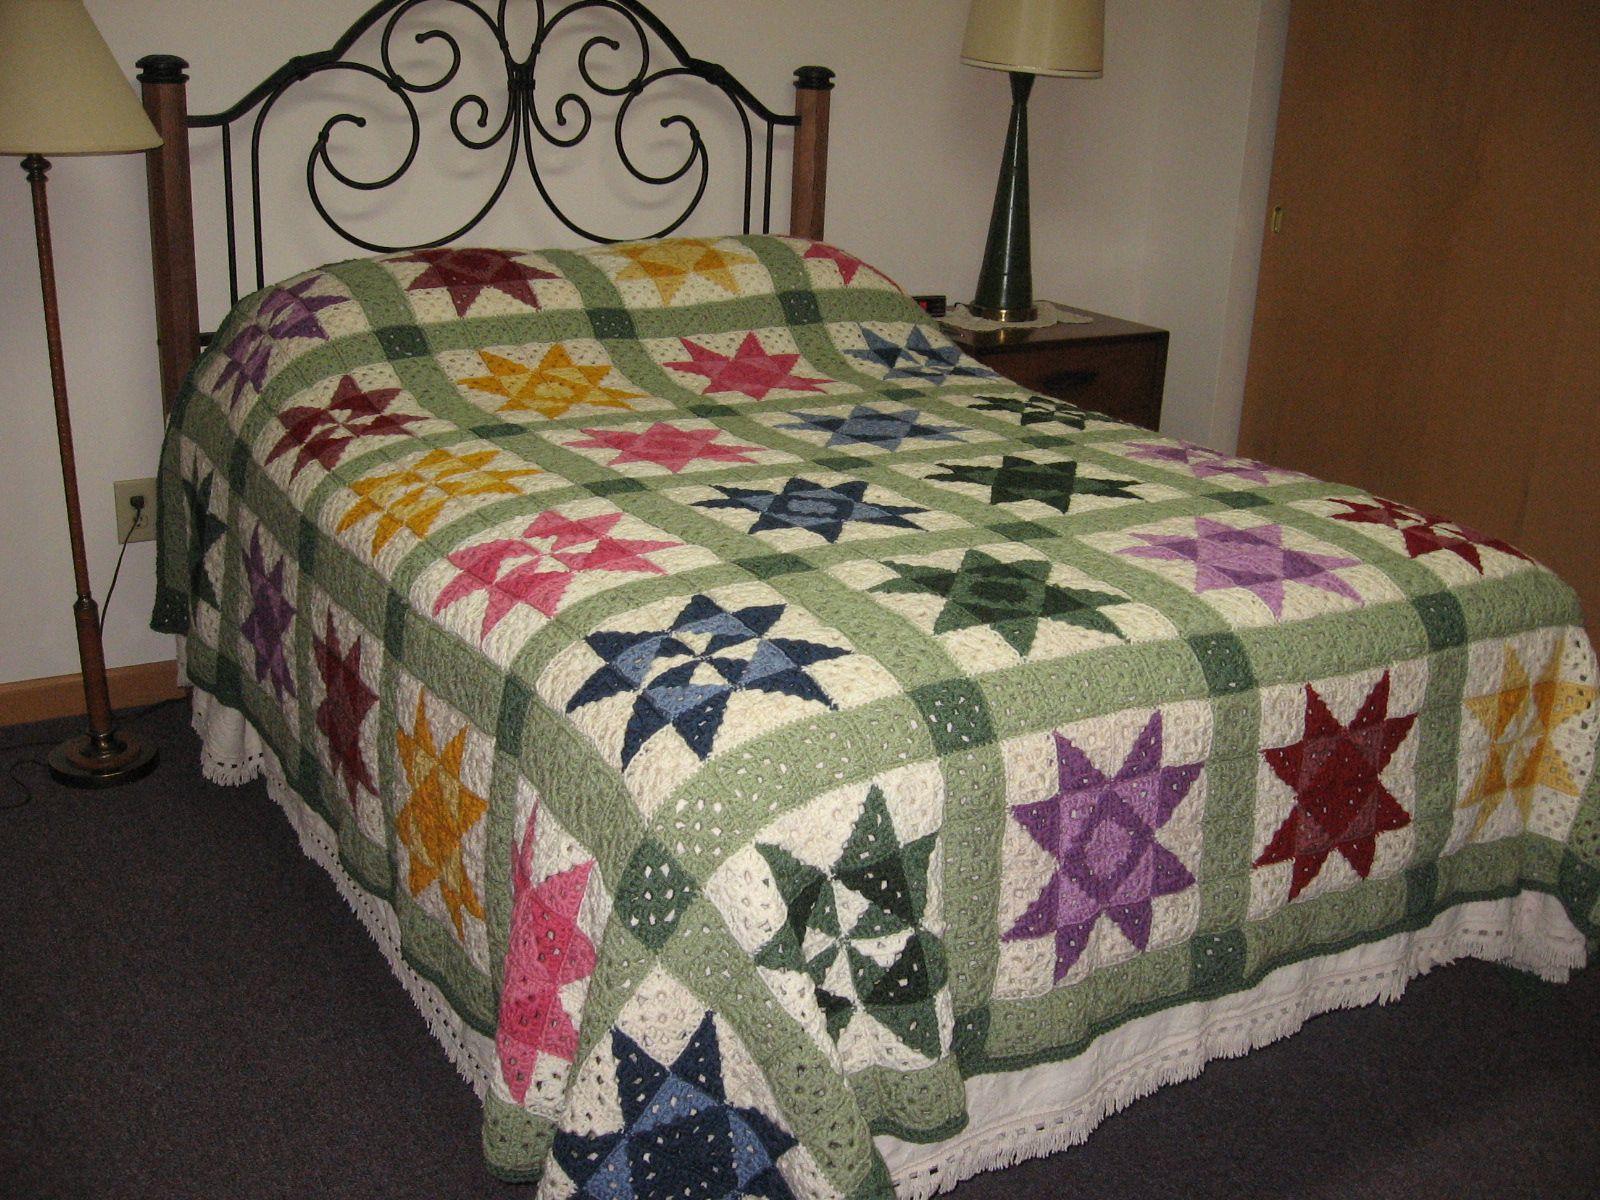 Crochethome crochet quilt pattern pdf crochet pinterest loom crochethome crochet quilt pattern pdf bankloansurffo Choice Image